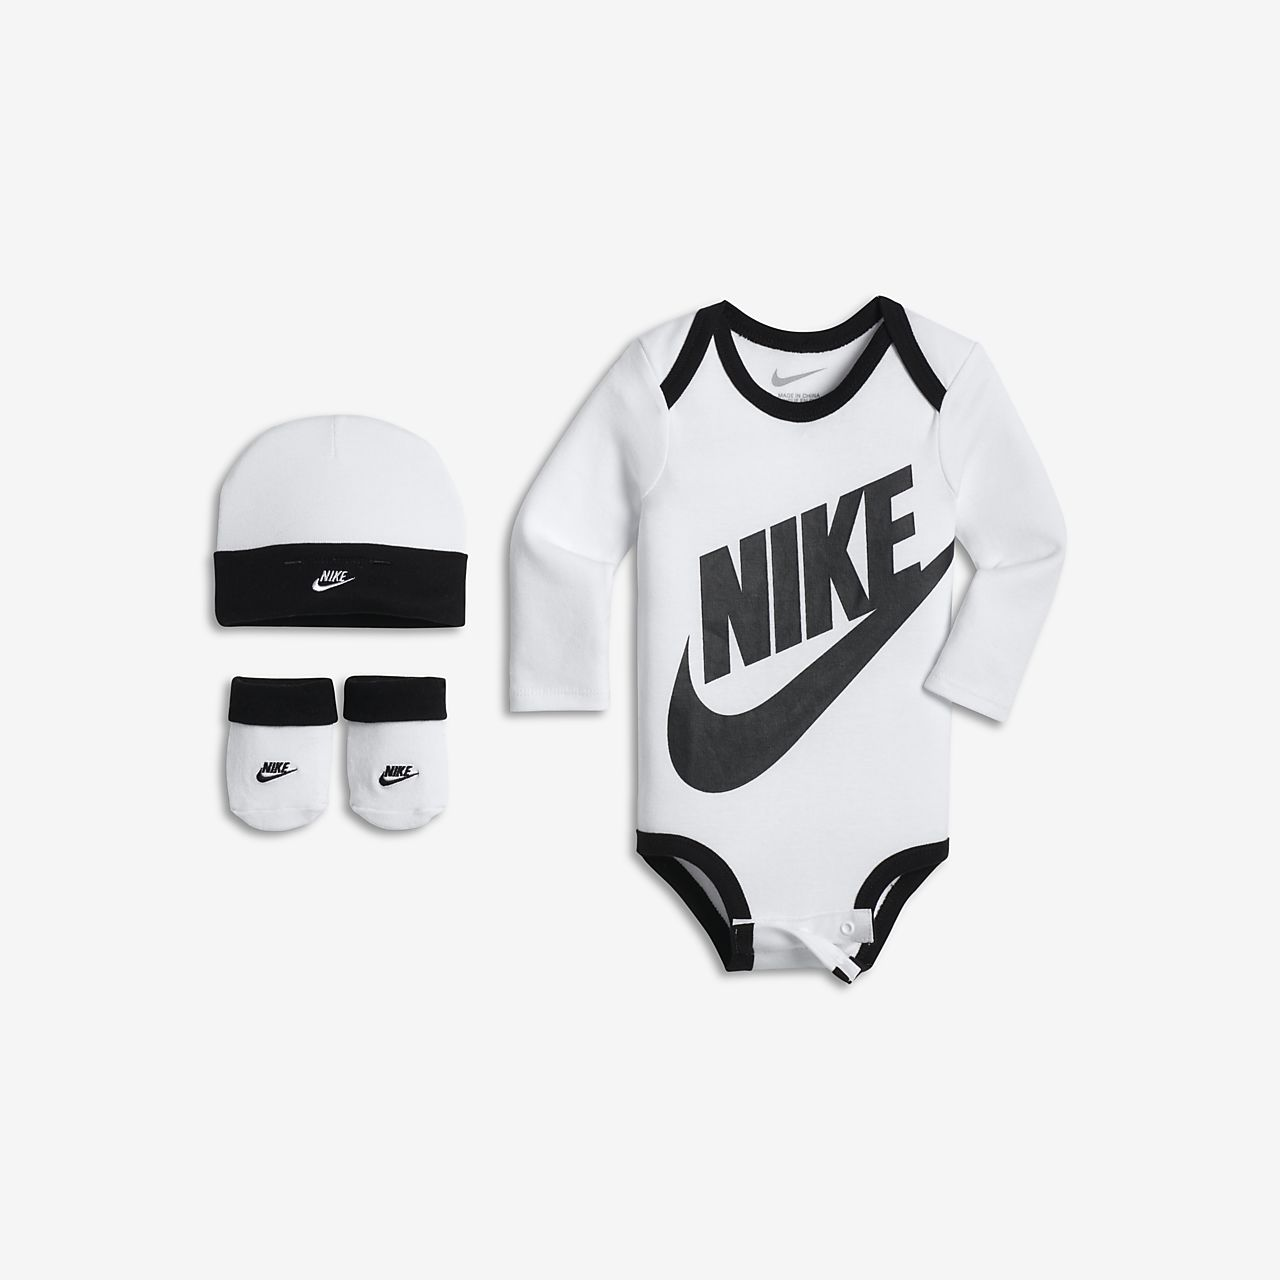 Ensemble trois pièces Nike Futura pour Bébé garçon 0a942566e1e